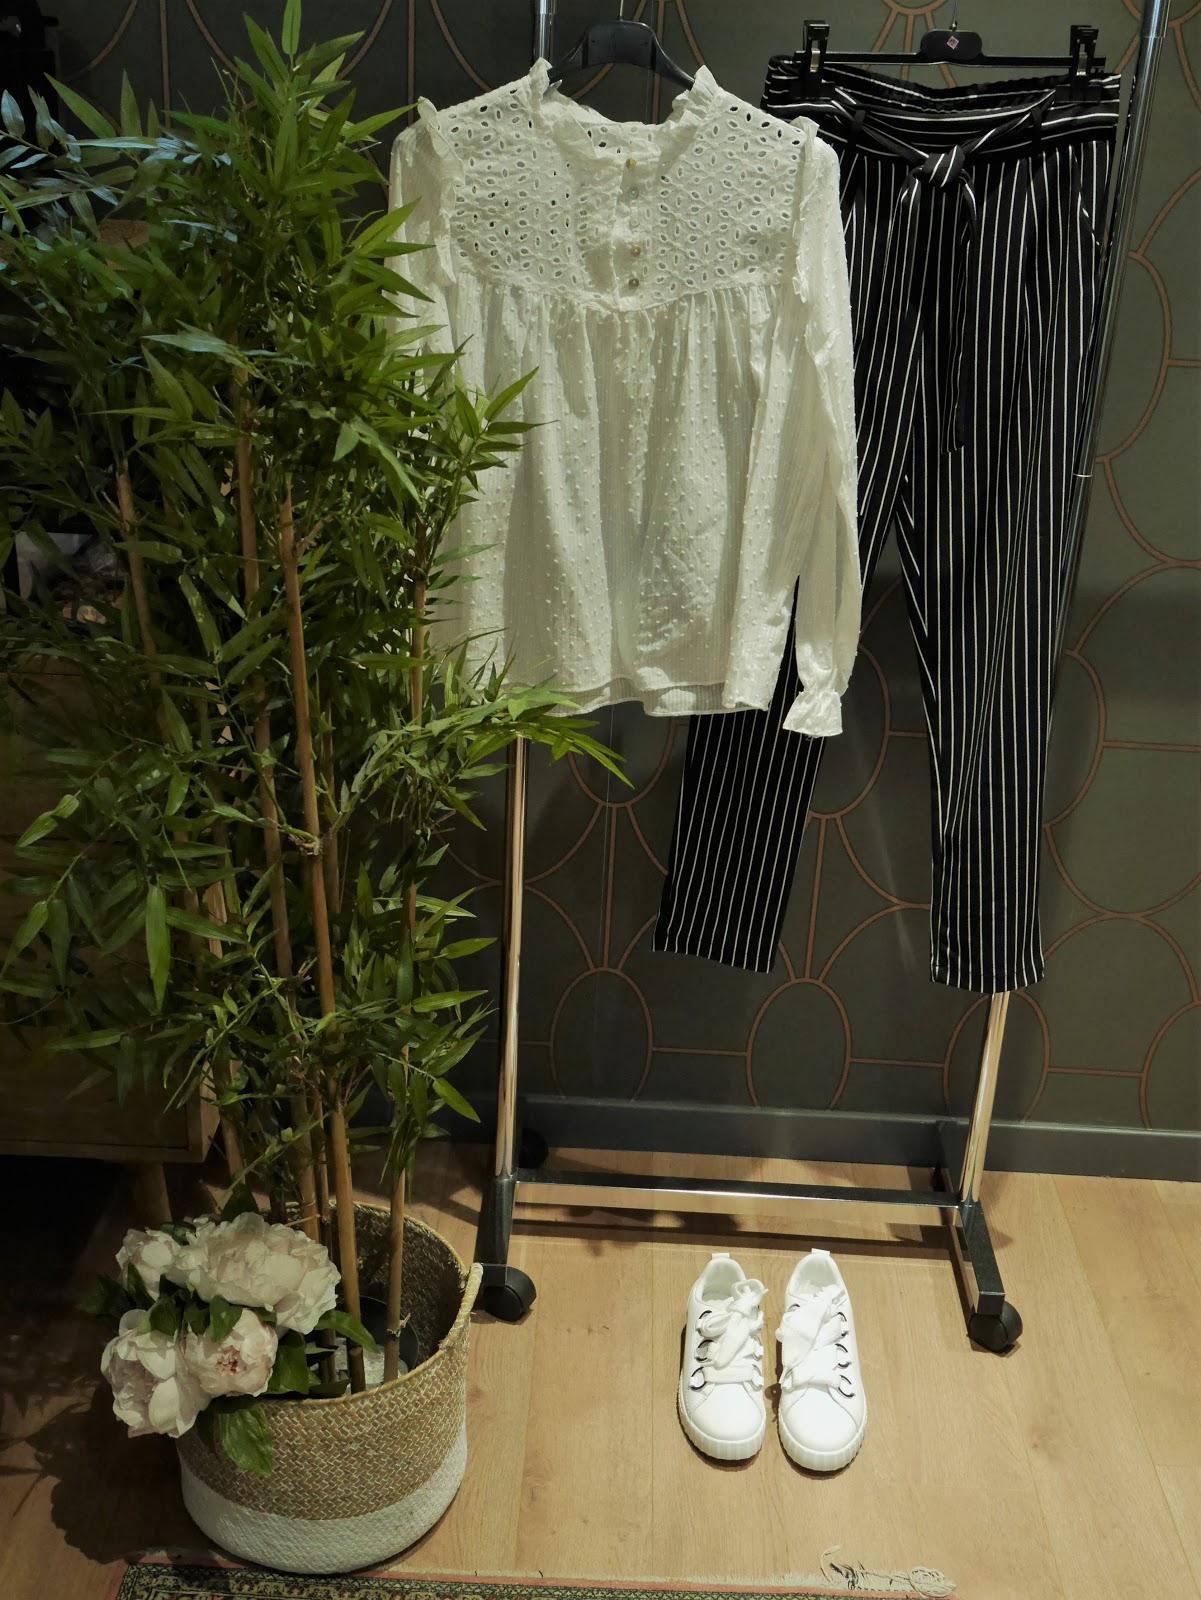 twinz-boutique-pret-a-porter-antony-chemise-pantalon-raye